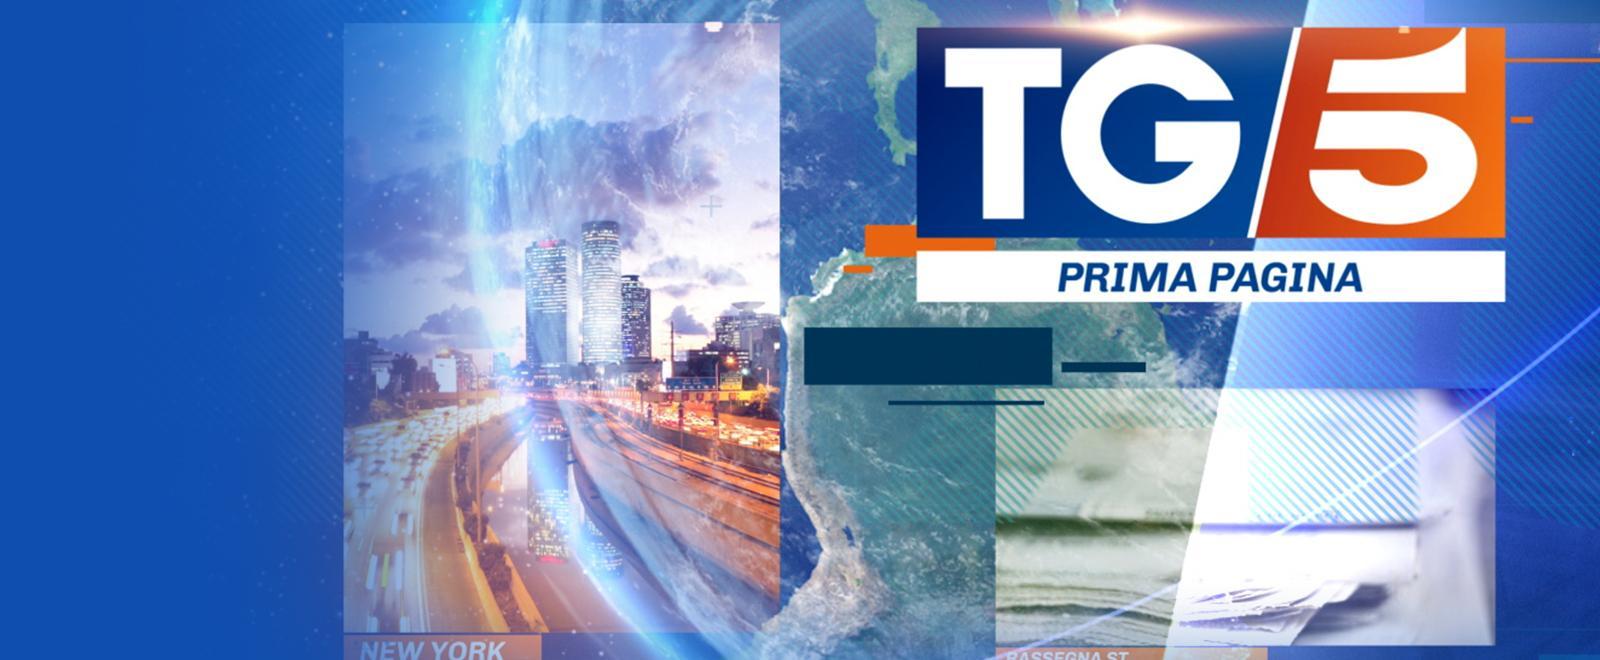 Tg5 Prima Pagina